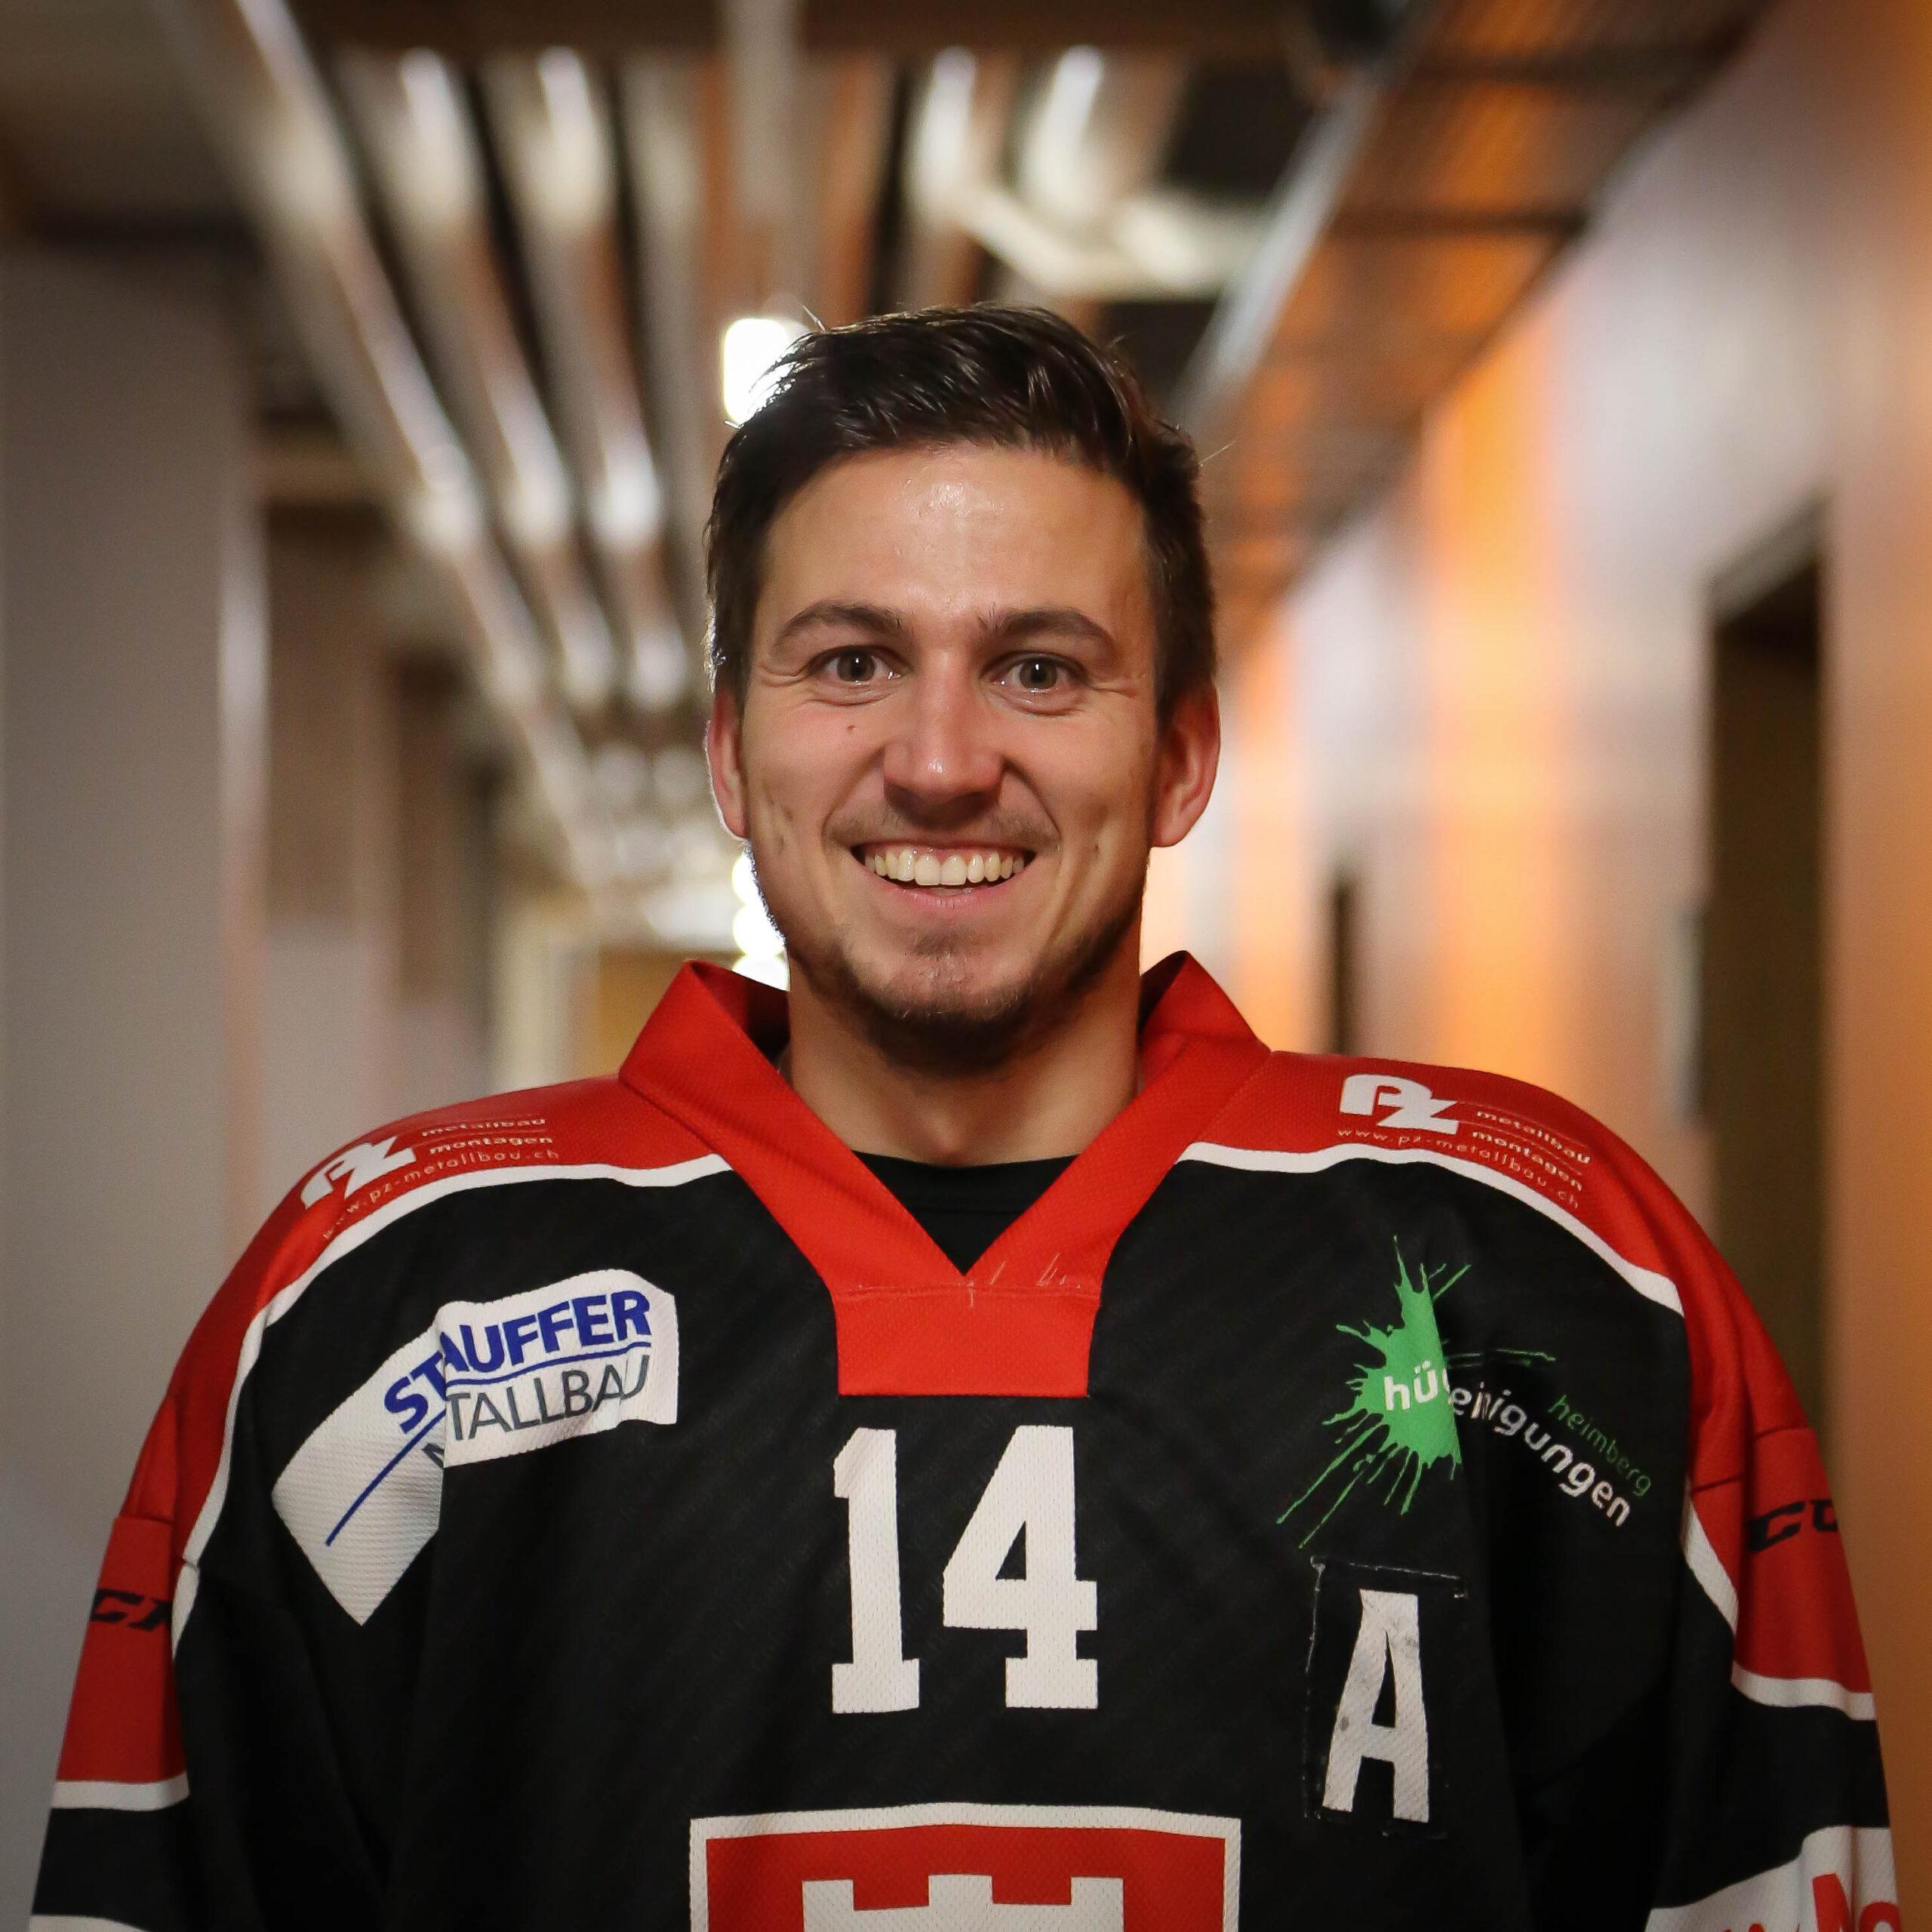 Stefan Baumgartner